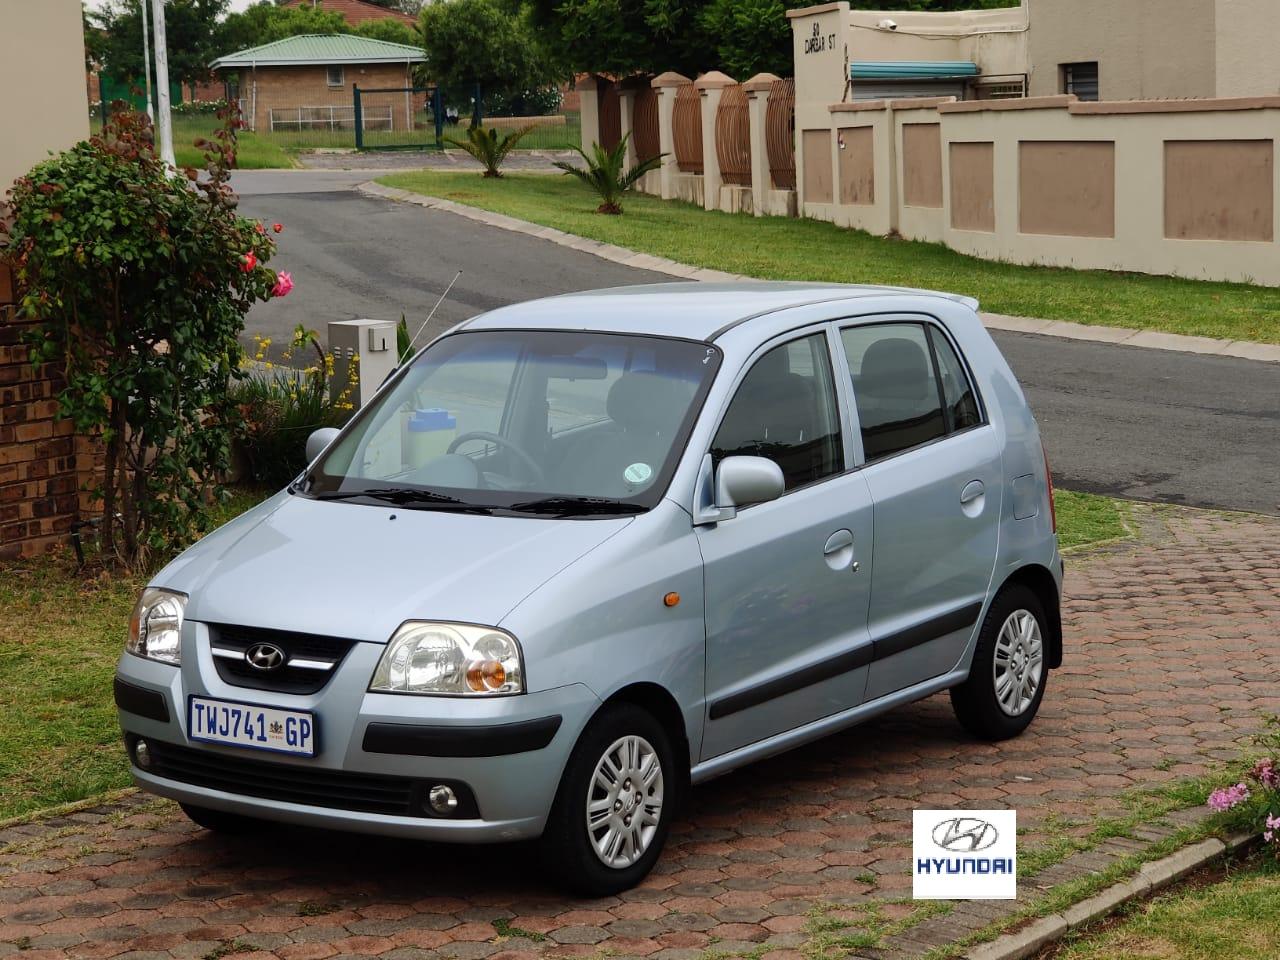 2006 Hyundai Atos Prime 1.1 GLS automatic